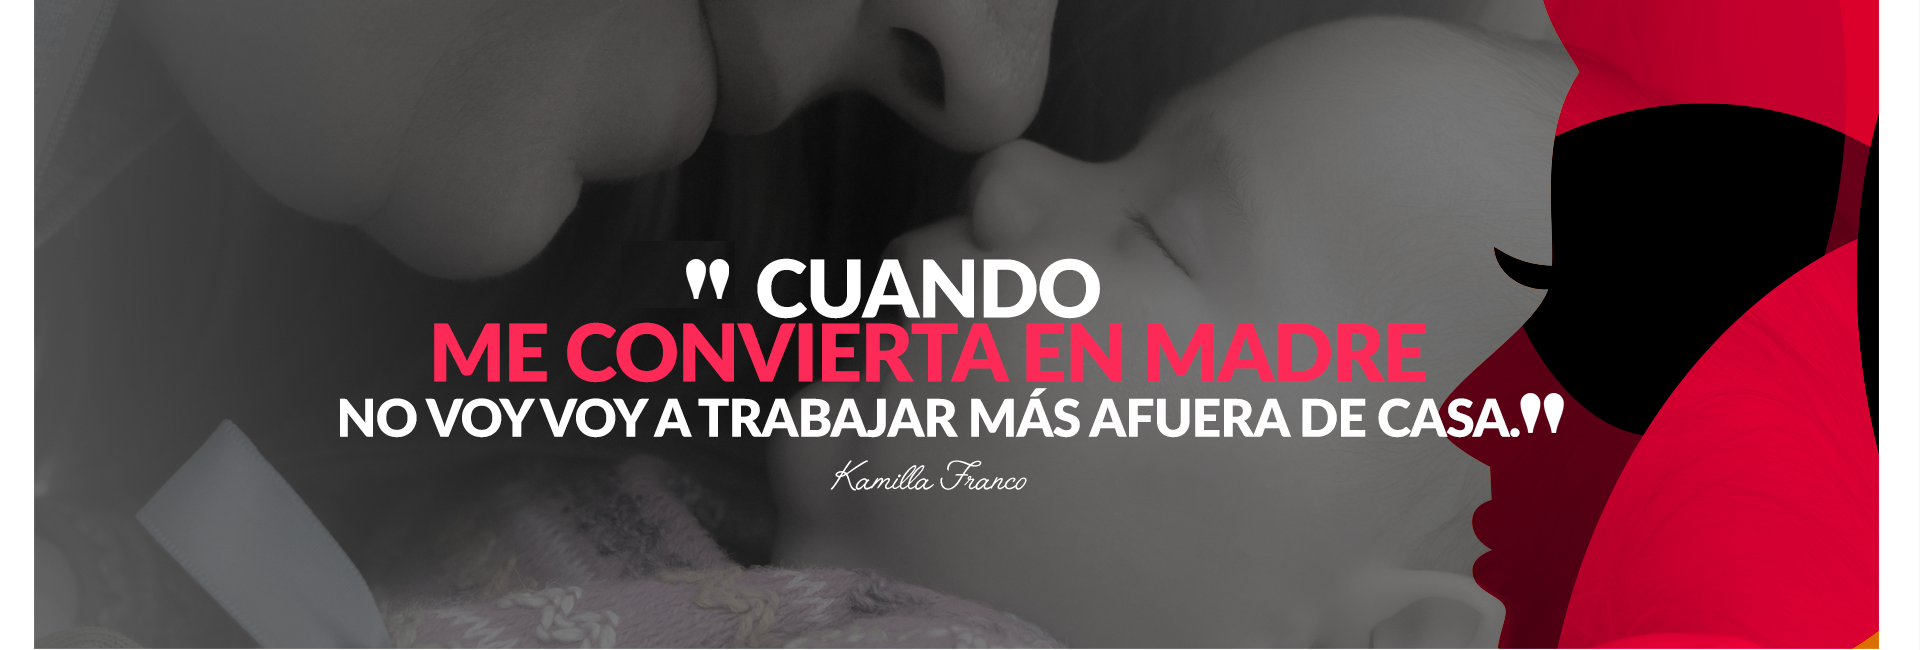 Kamilla Franco: Ser madre hizo que me convirtiera en freelancer